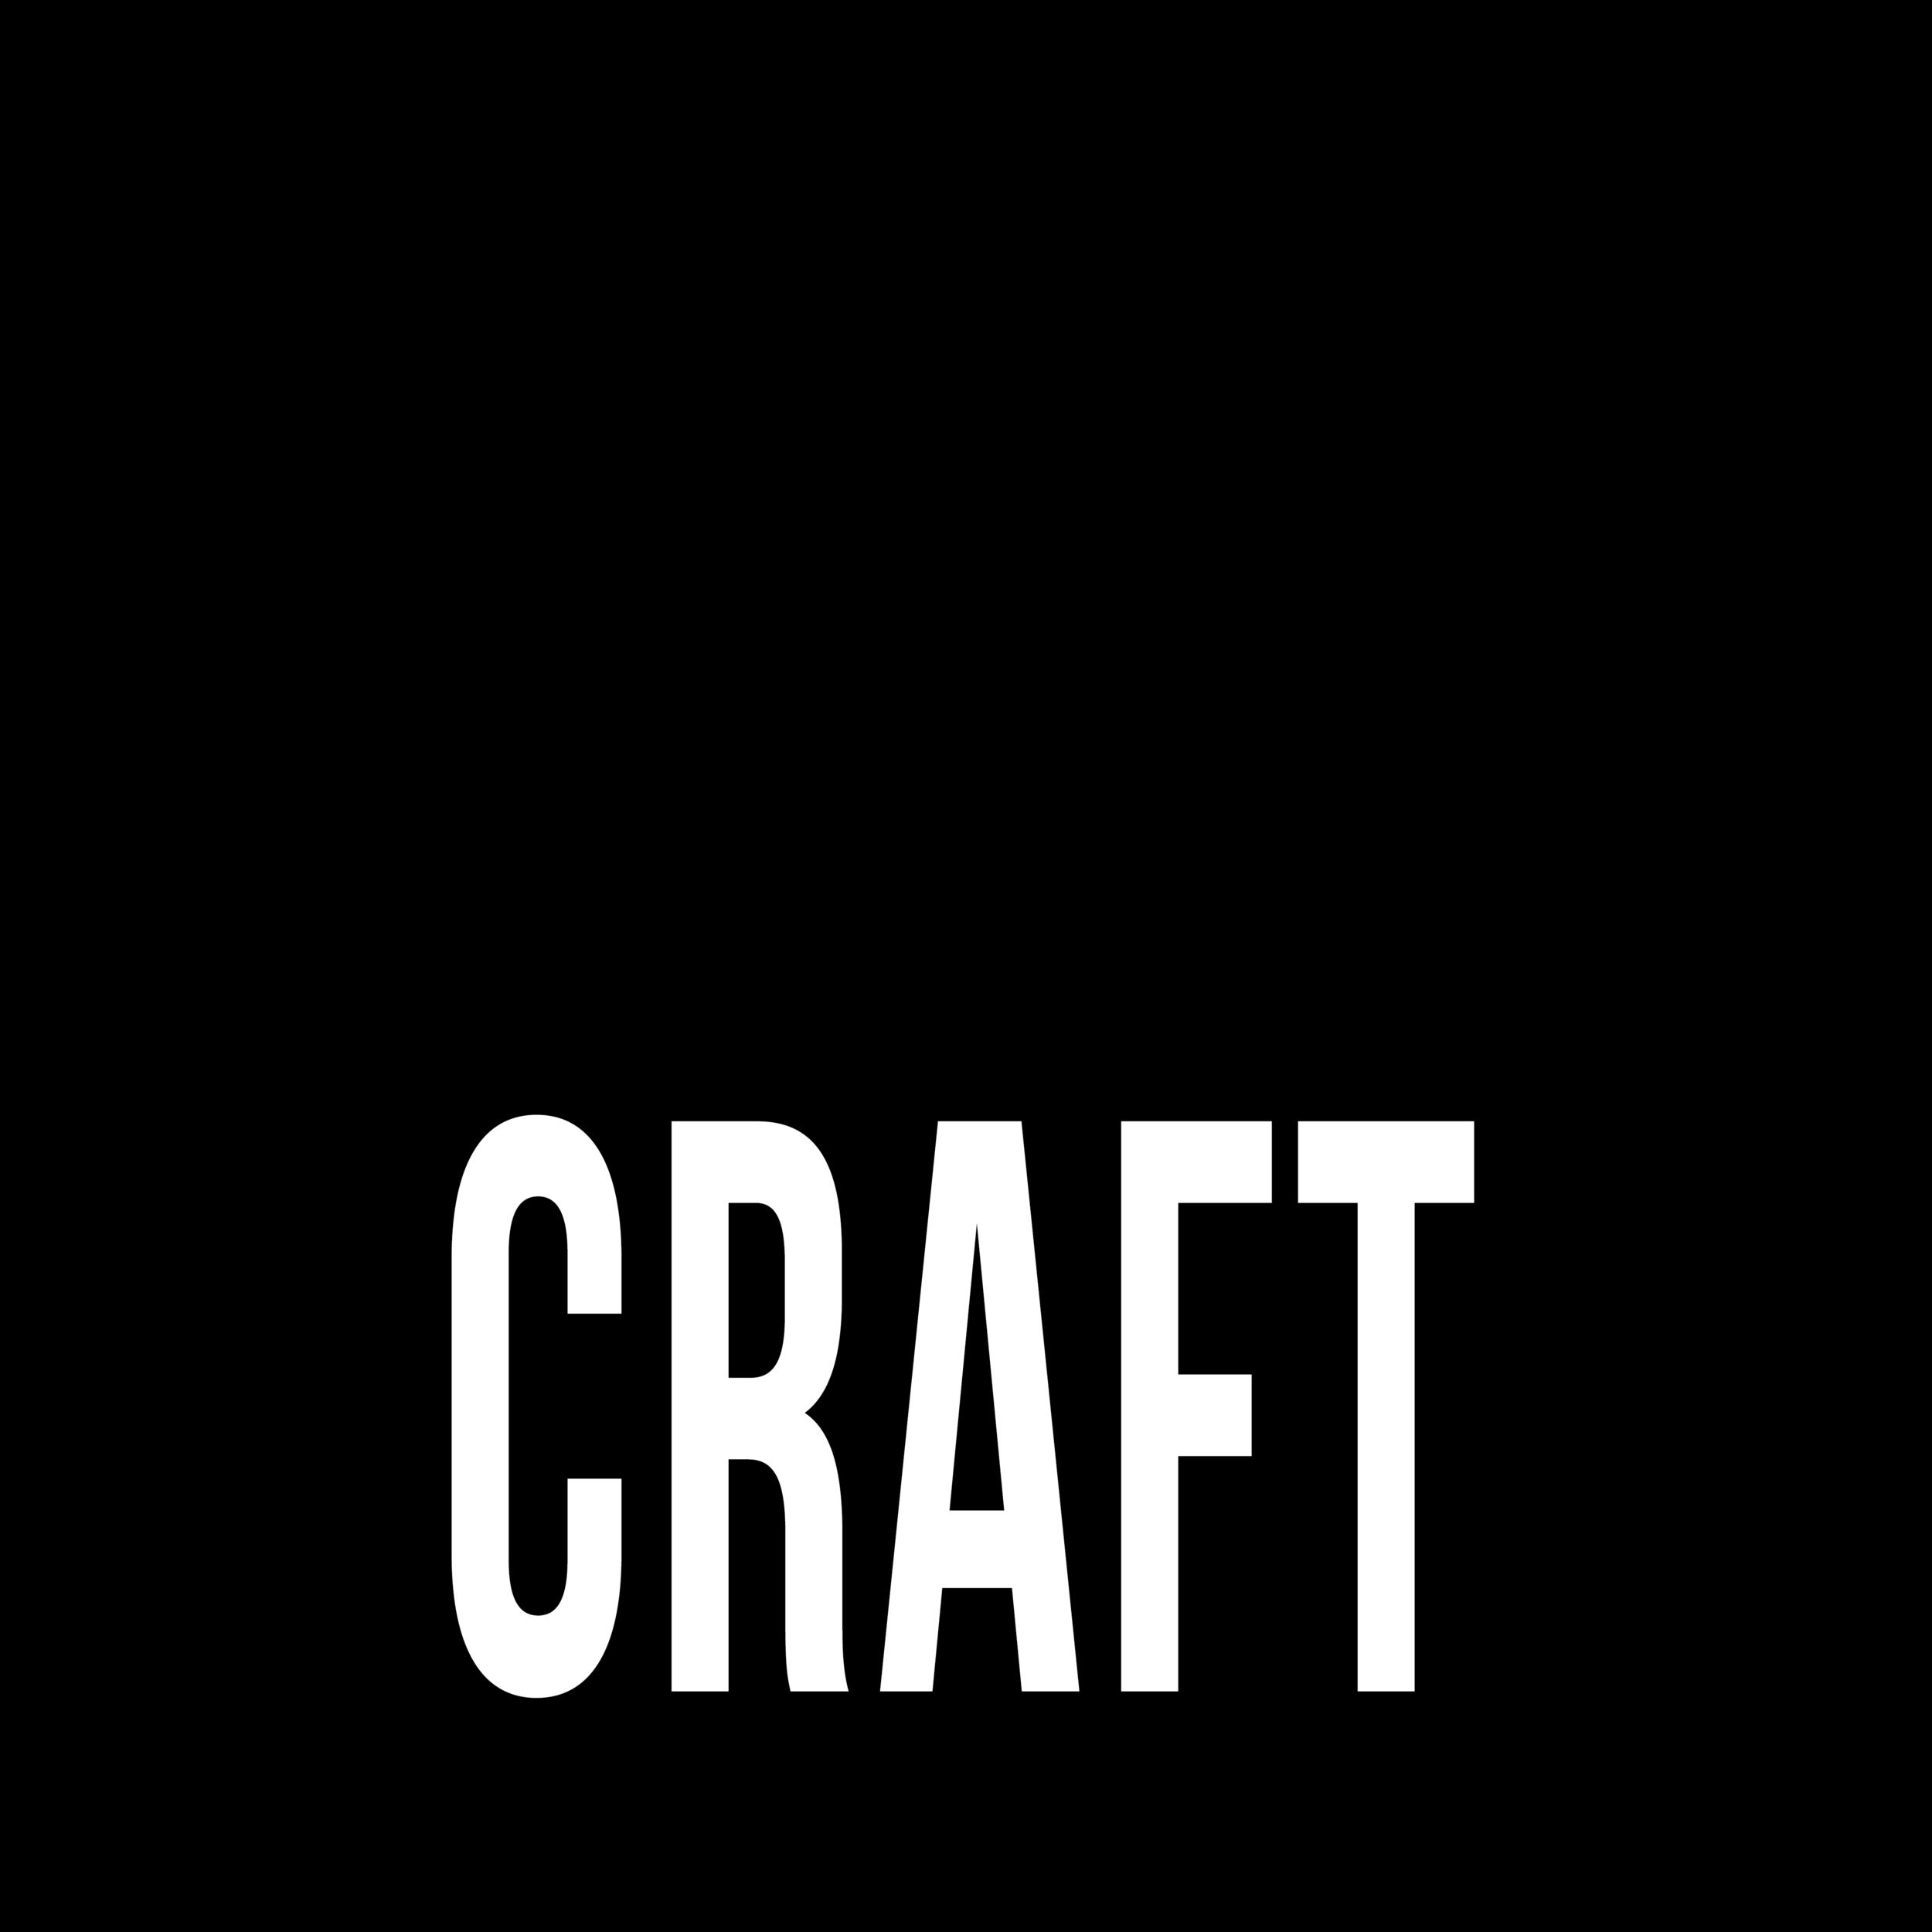 NASTY CRAFT-01.png